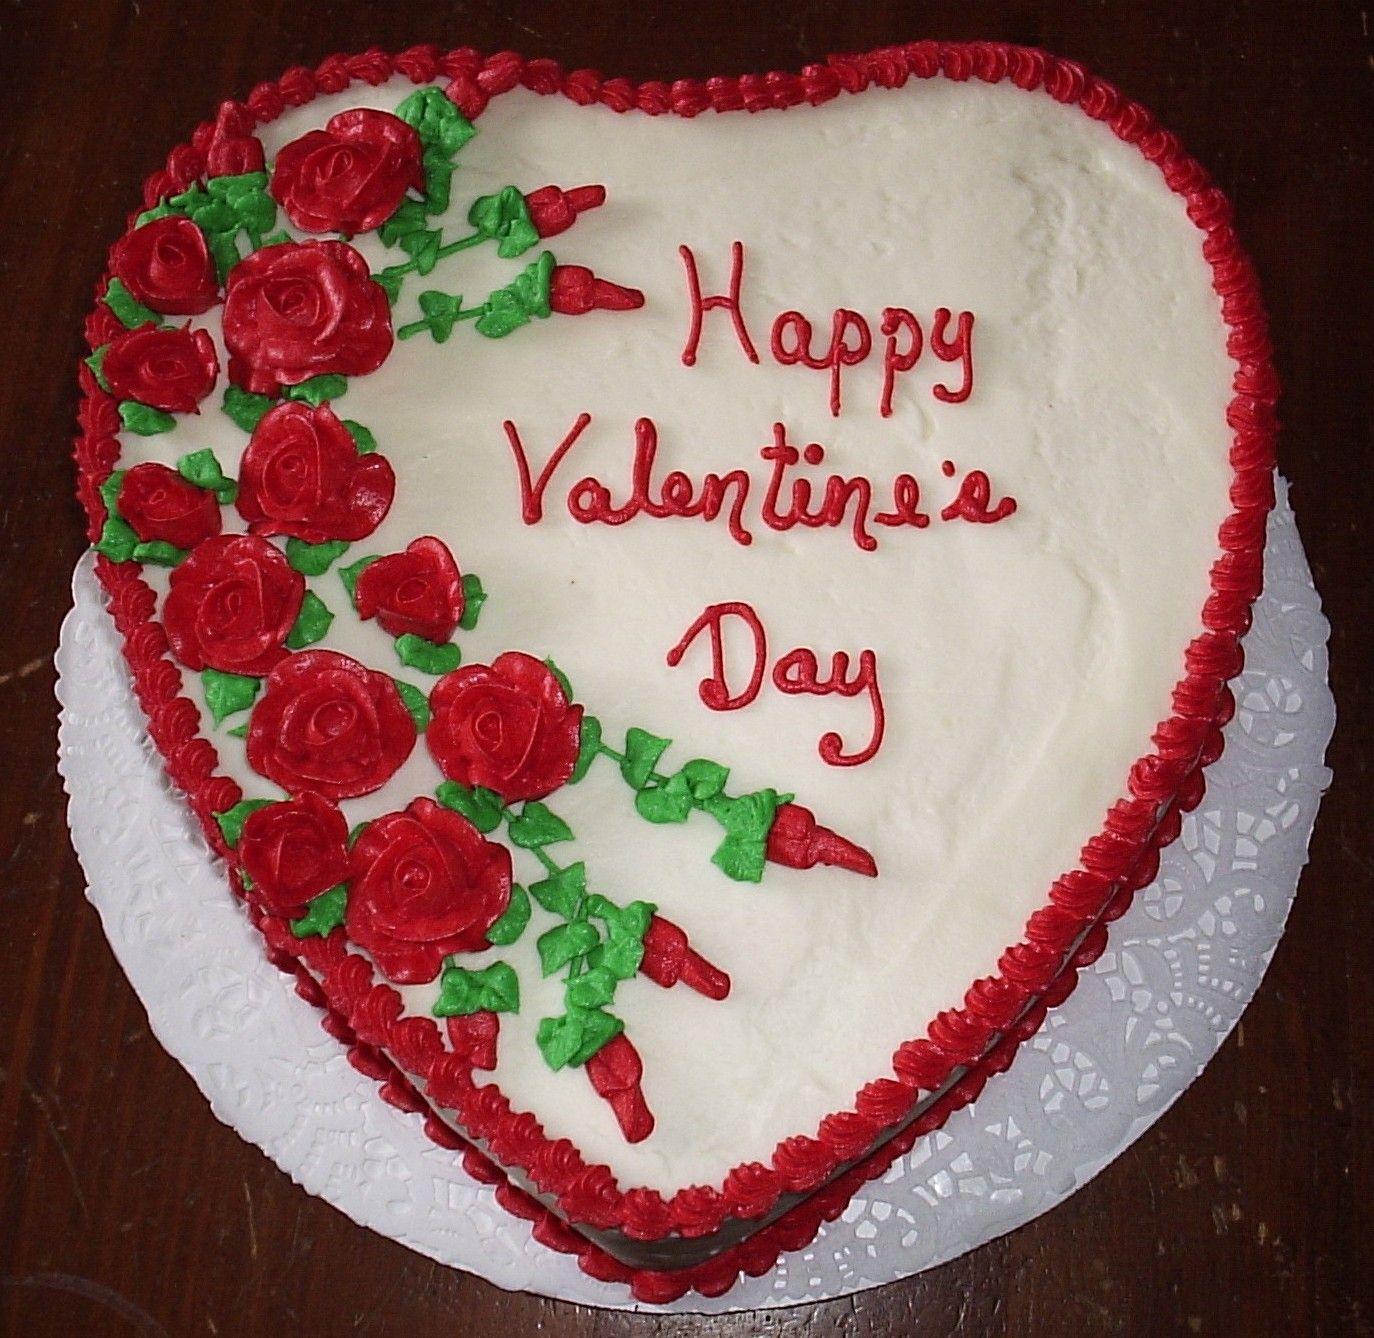 Valentineus day heart shaped red velvet cake with cream cheese